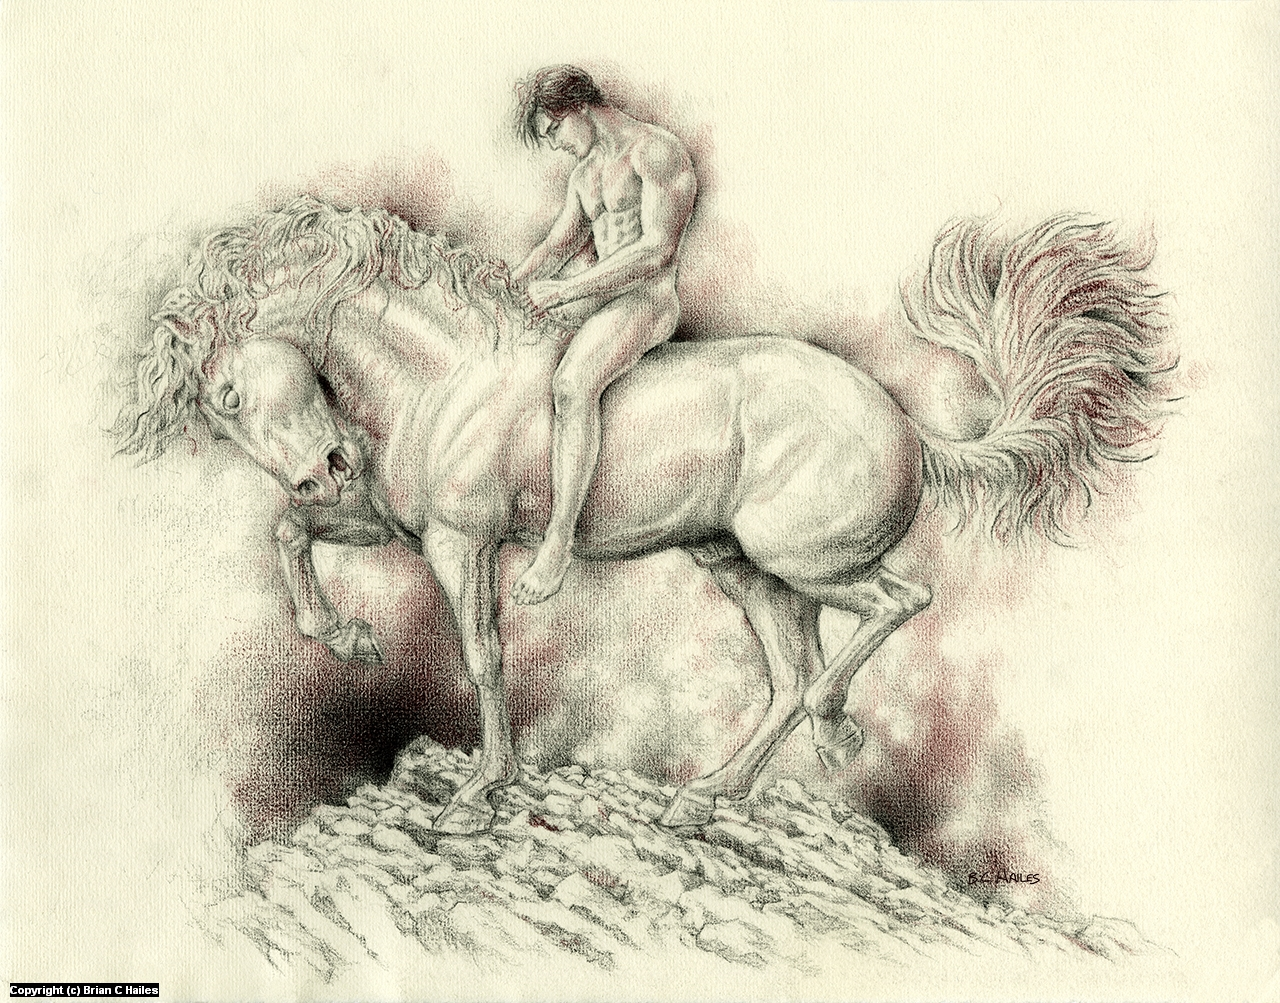 Gentleman of Adversity Artwork by Brian C Hailes